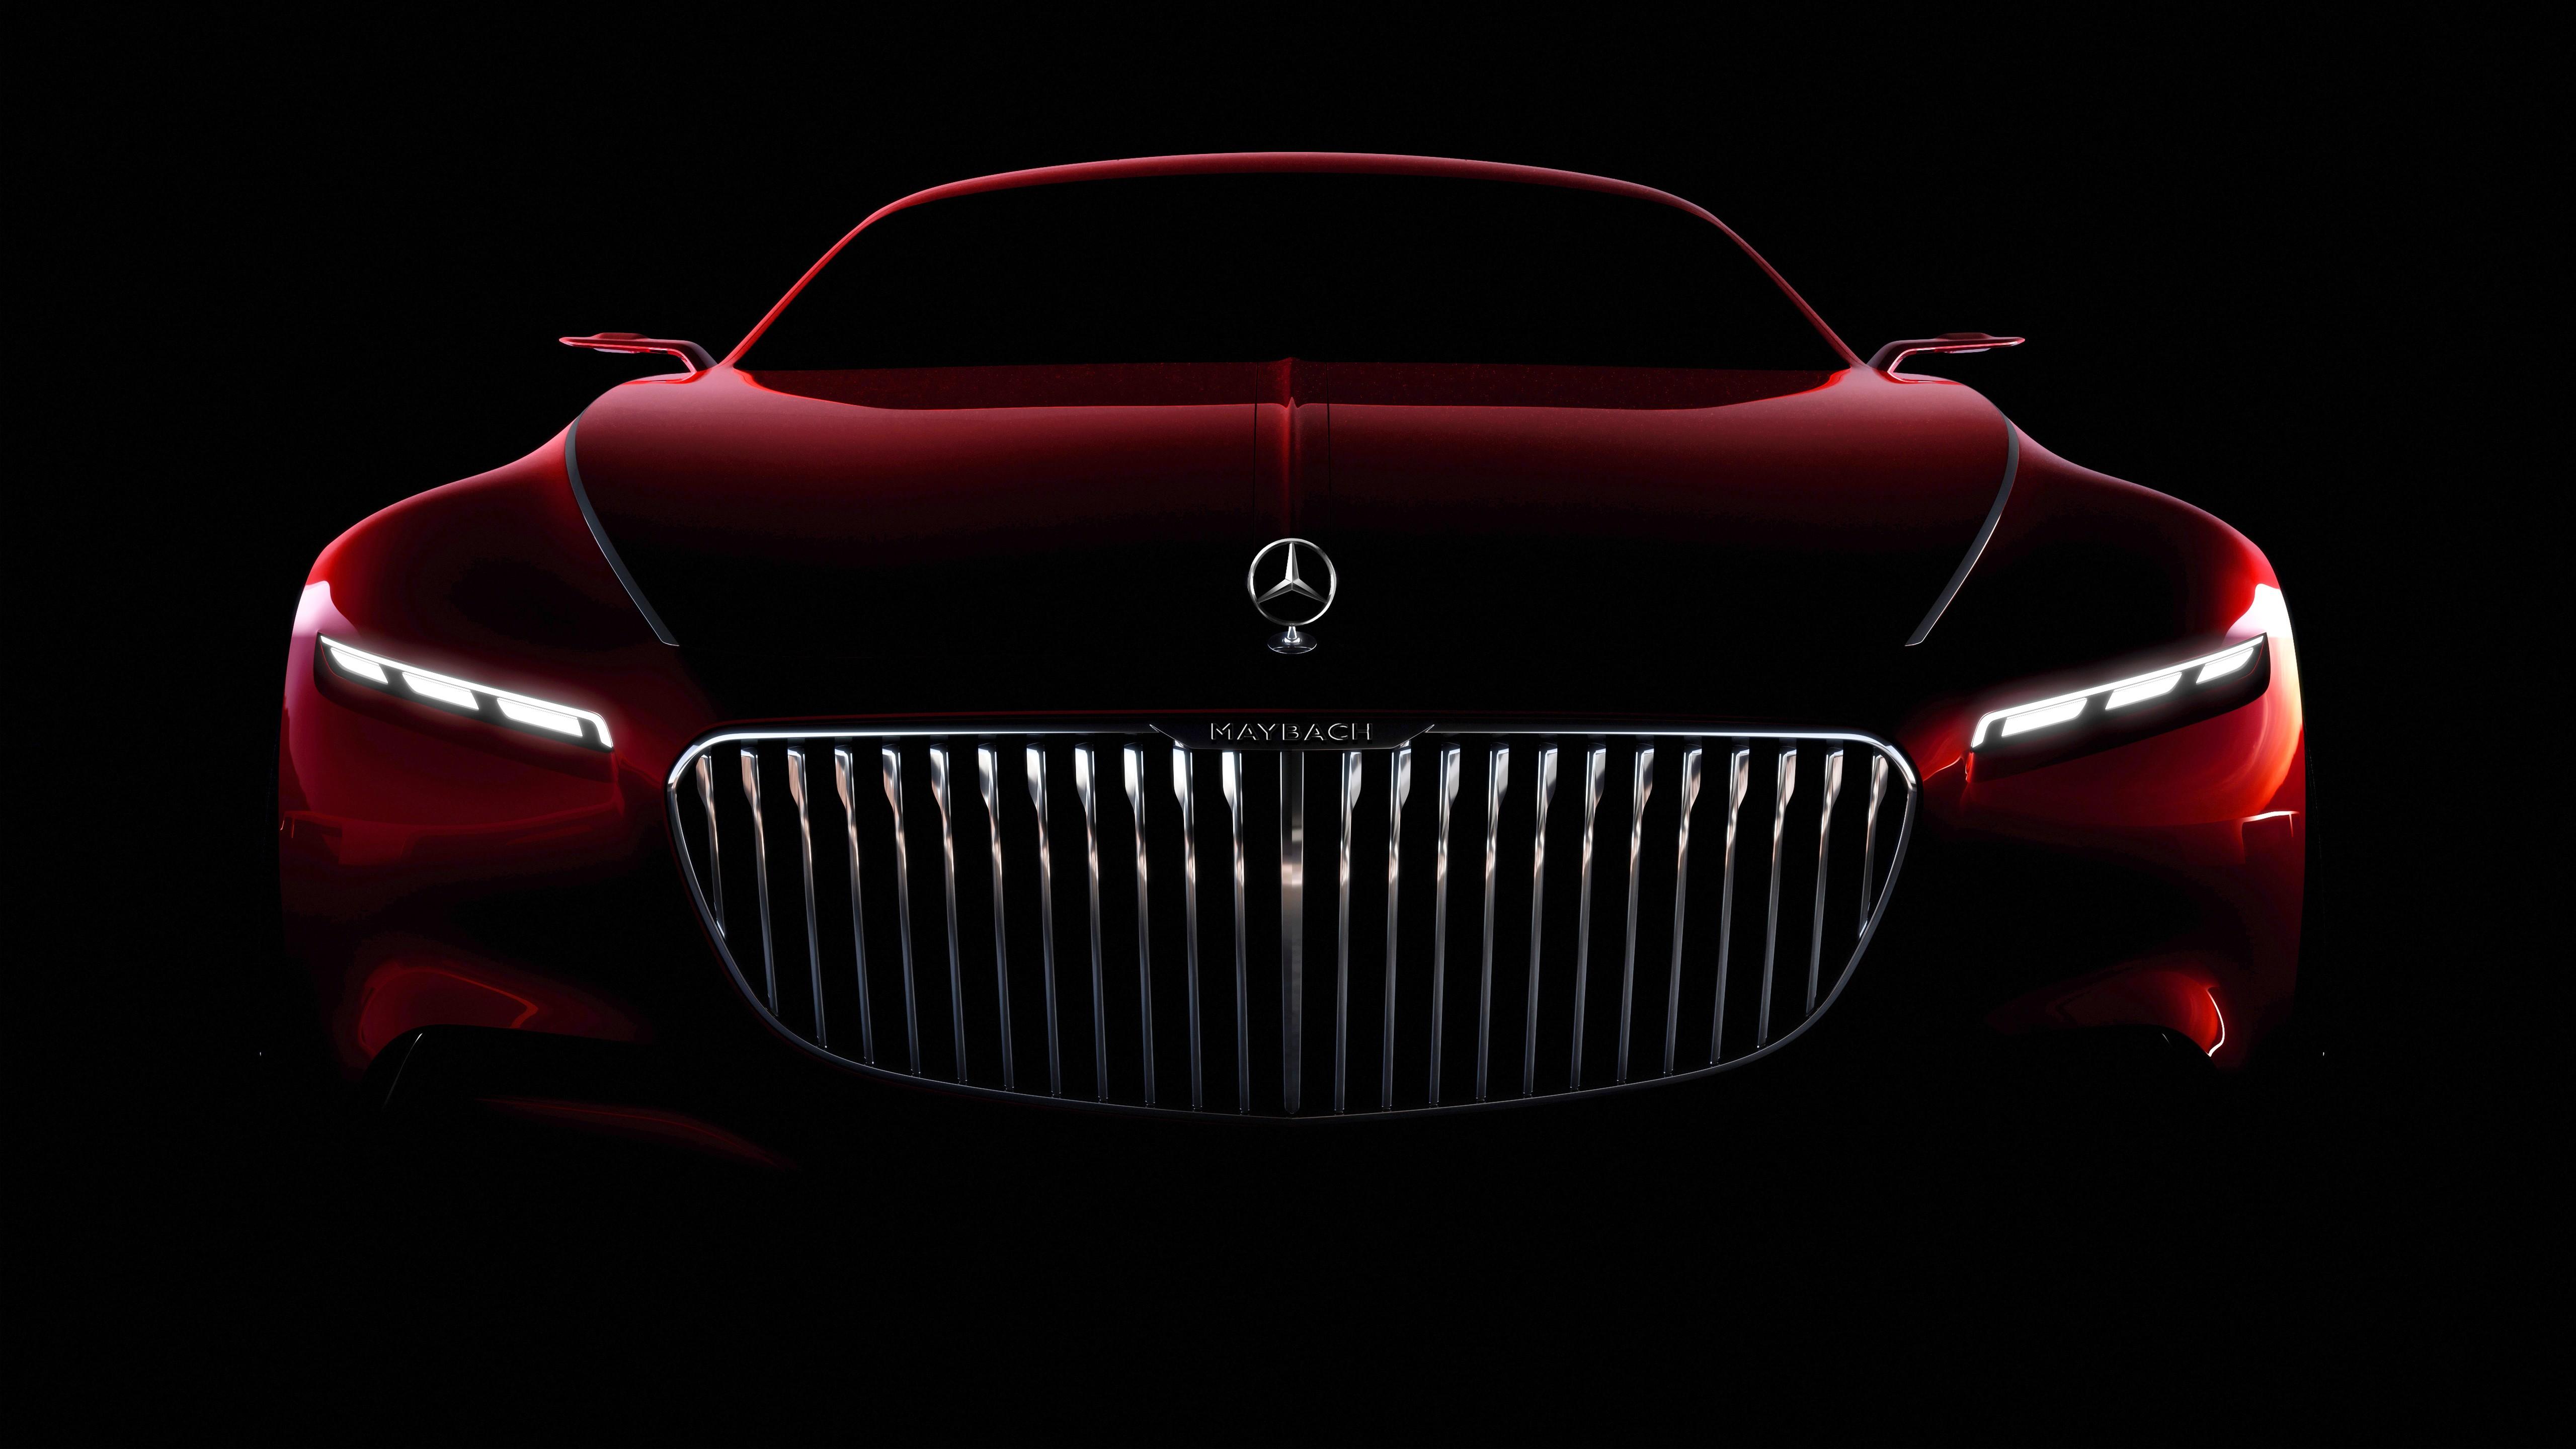 Vision Mercedes Maybach 6 Coupe 5k Wallpaper Hd Car